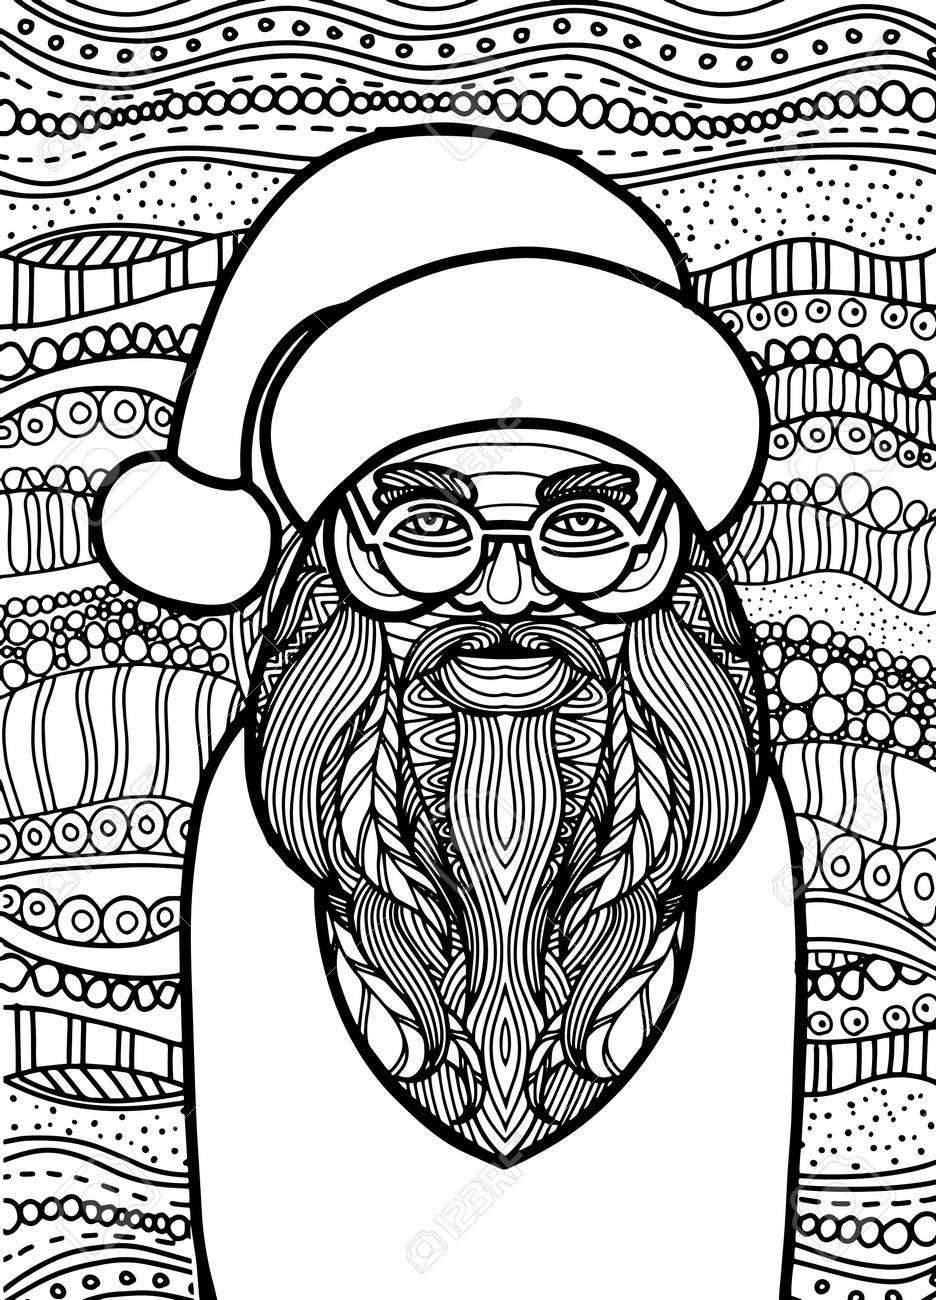 Coloriage Pere Noel Licorne.Dessin De Style Pere Noel Pour Livre De Coloriage Tatouage